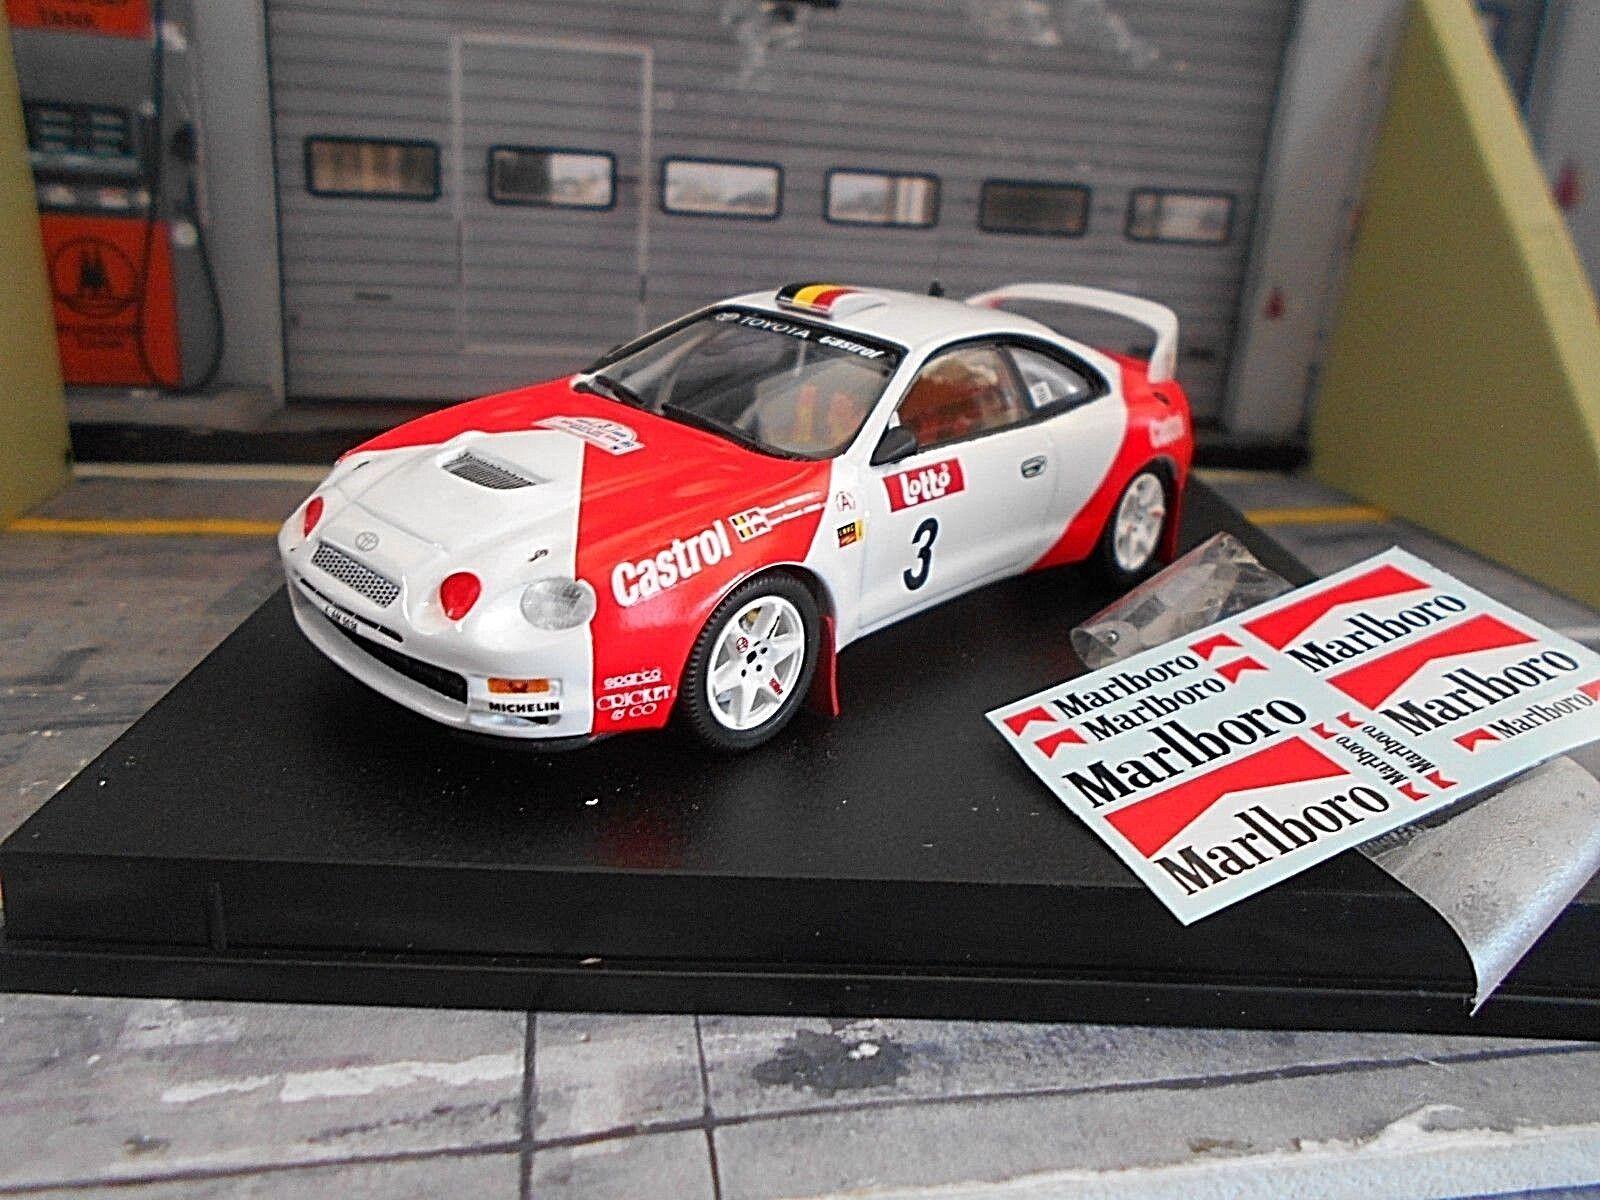 Toyota Celica st205 GT Rallye Boucles de Spa 1996  3 VERREYDT Marlb Trofeu 1 43